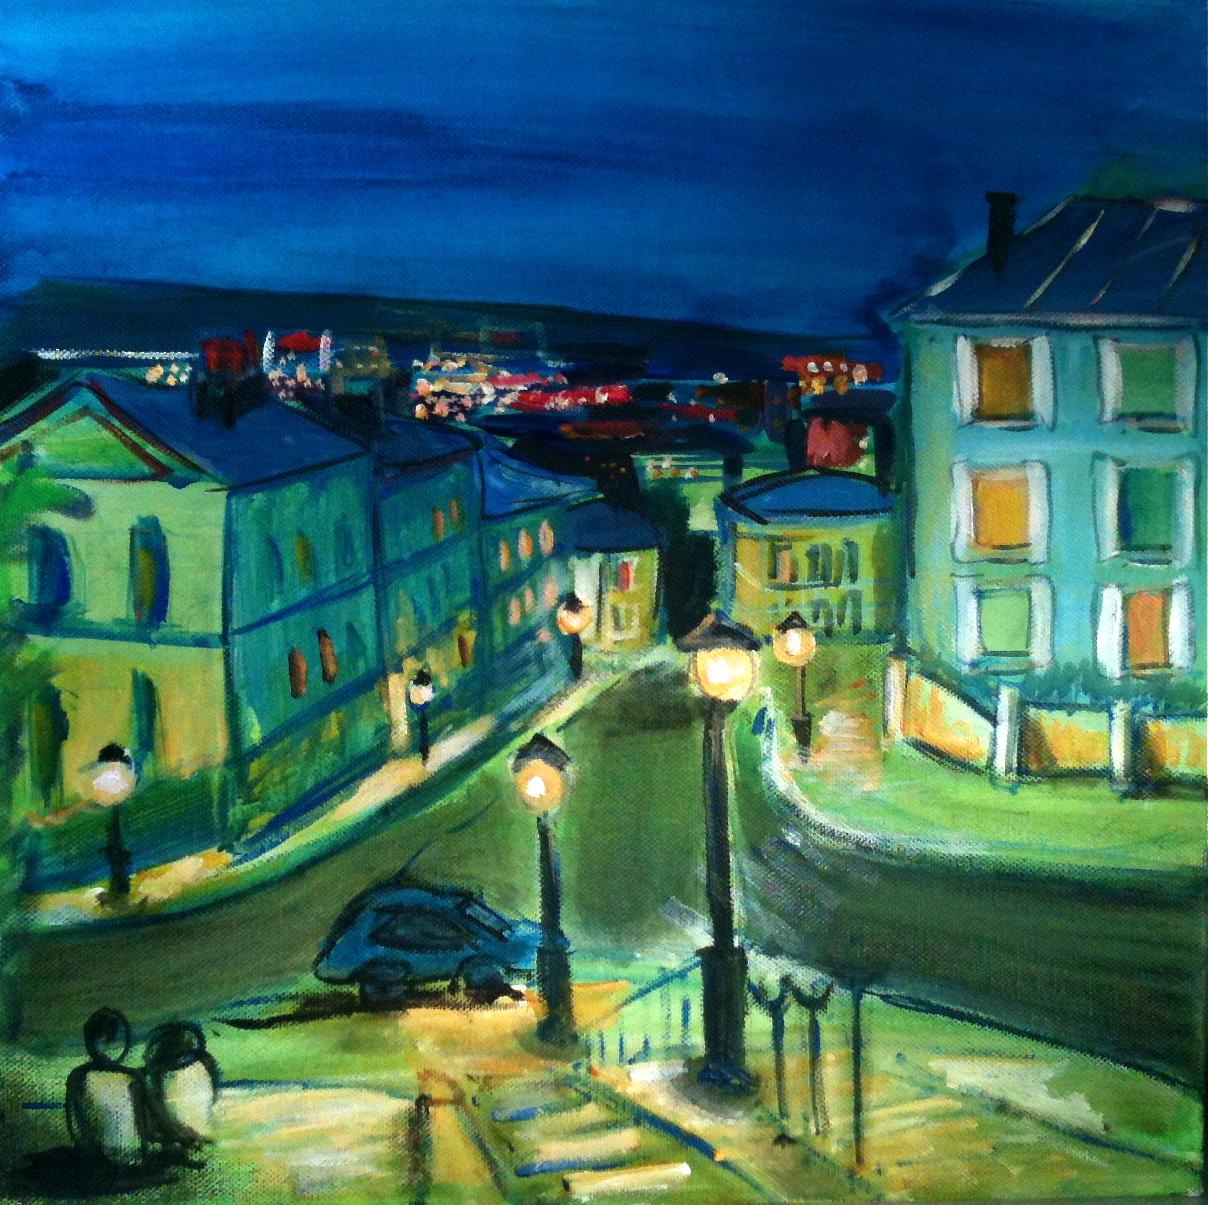 Monmarrte nights